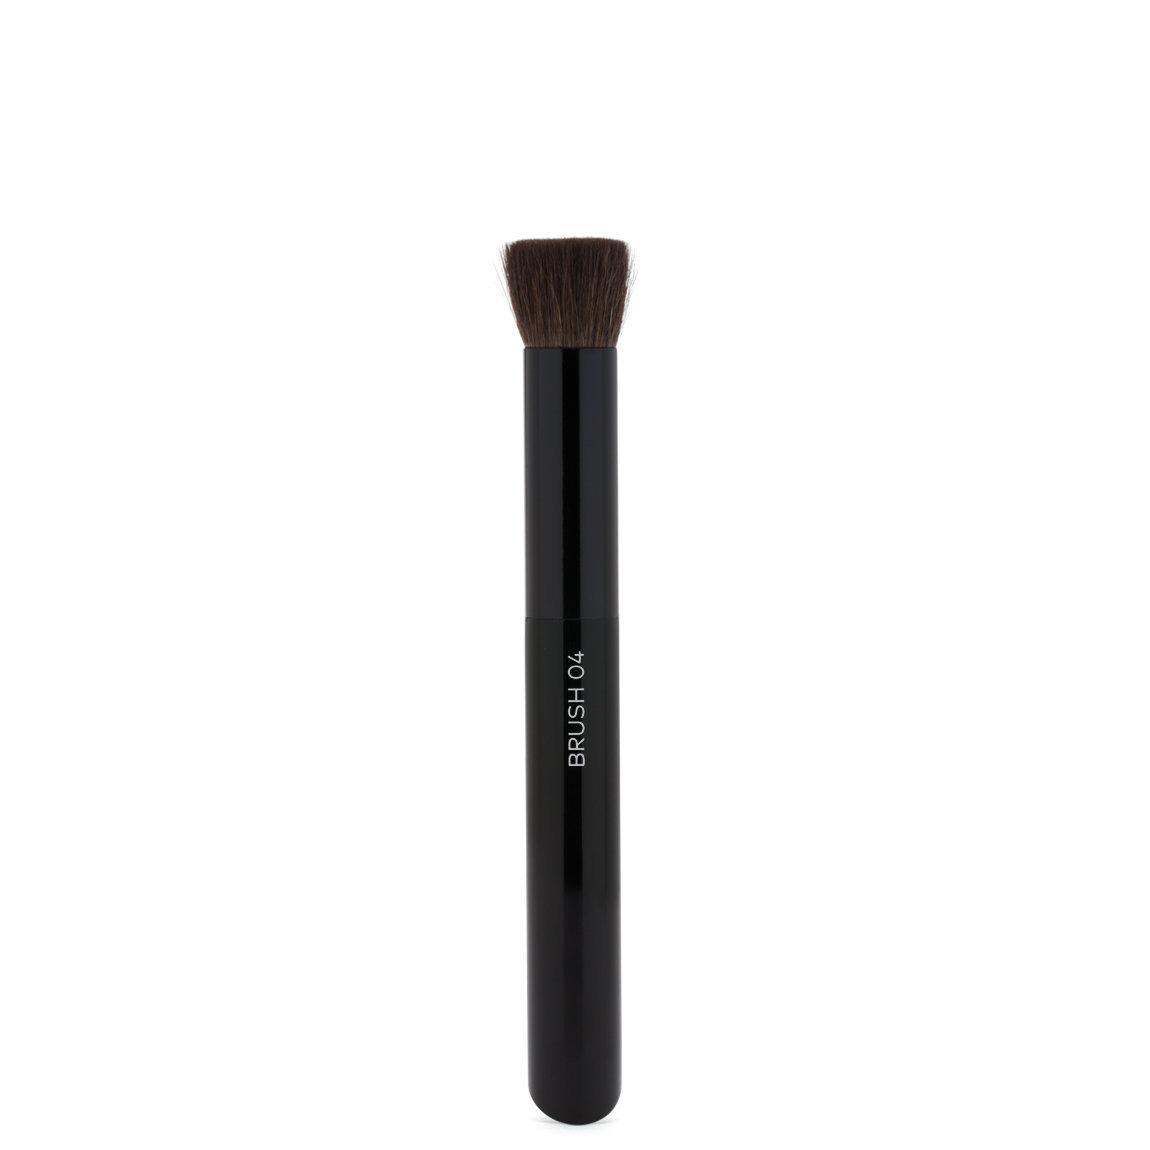 Beautylish Presents Yano Series Brush 04 Contour alternative view 1 - product swatch.